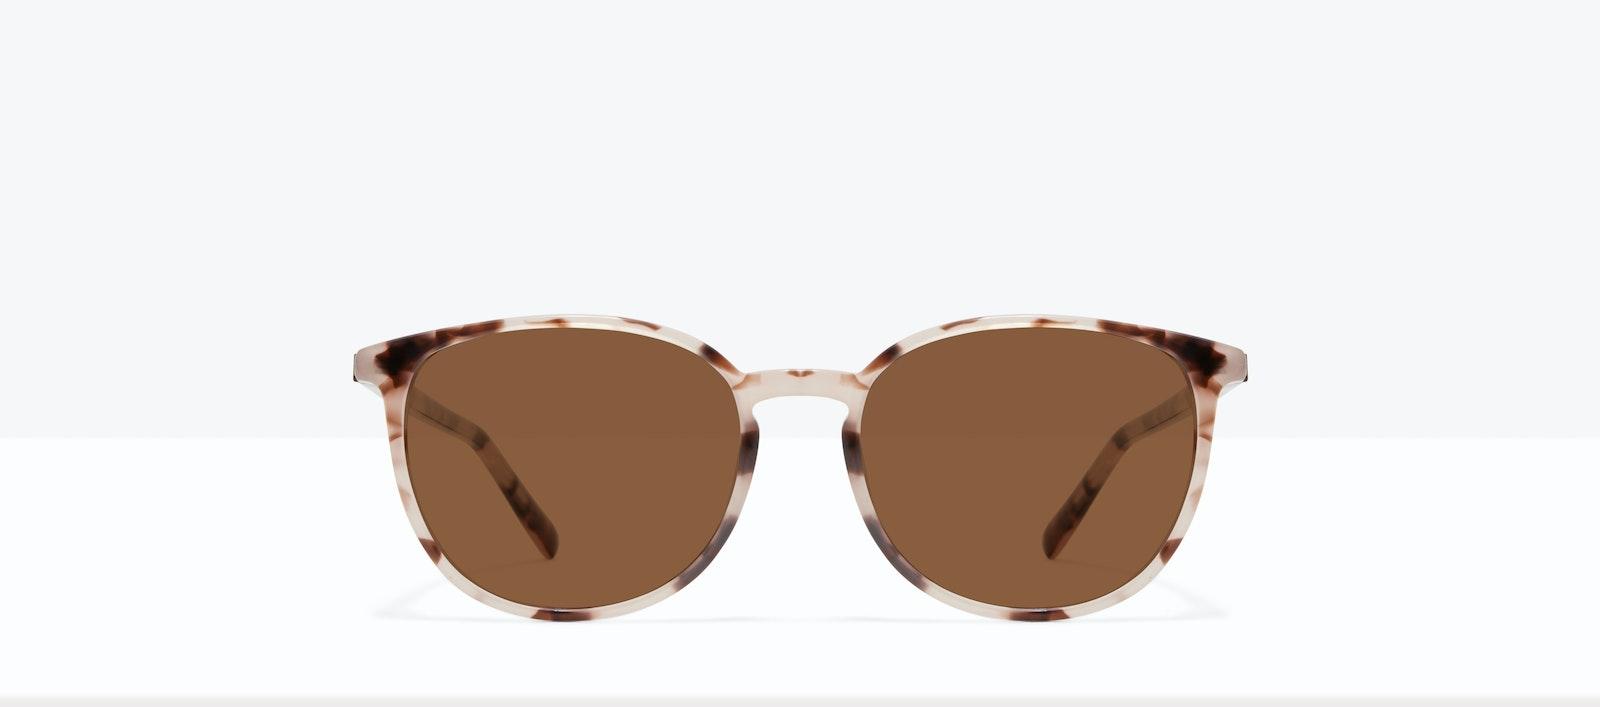 Affordable Fashion Glasses Round Sunglasses Women Femme Libre L Erzebeth Front